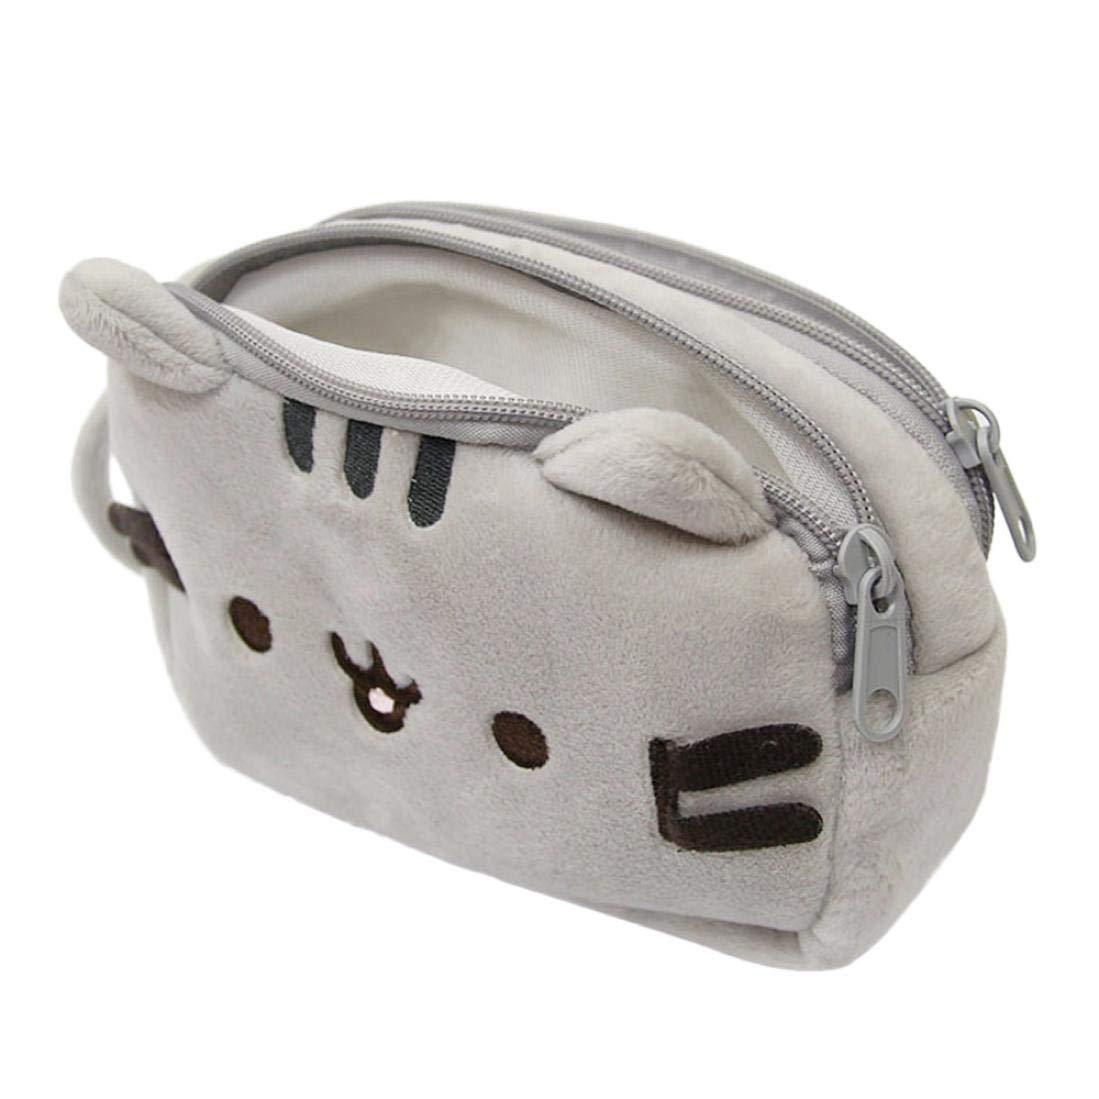 TAOtTAO - Estuche para lápices de gatos (felpa, bolígrafo, bolsa de maquillaje, bolsa de cosméticos, regalo de papelería): Amazon.es: Oficina y papelería